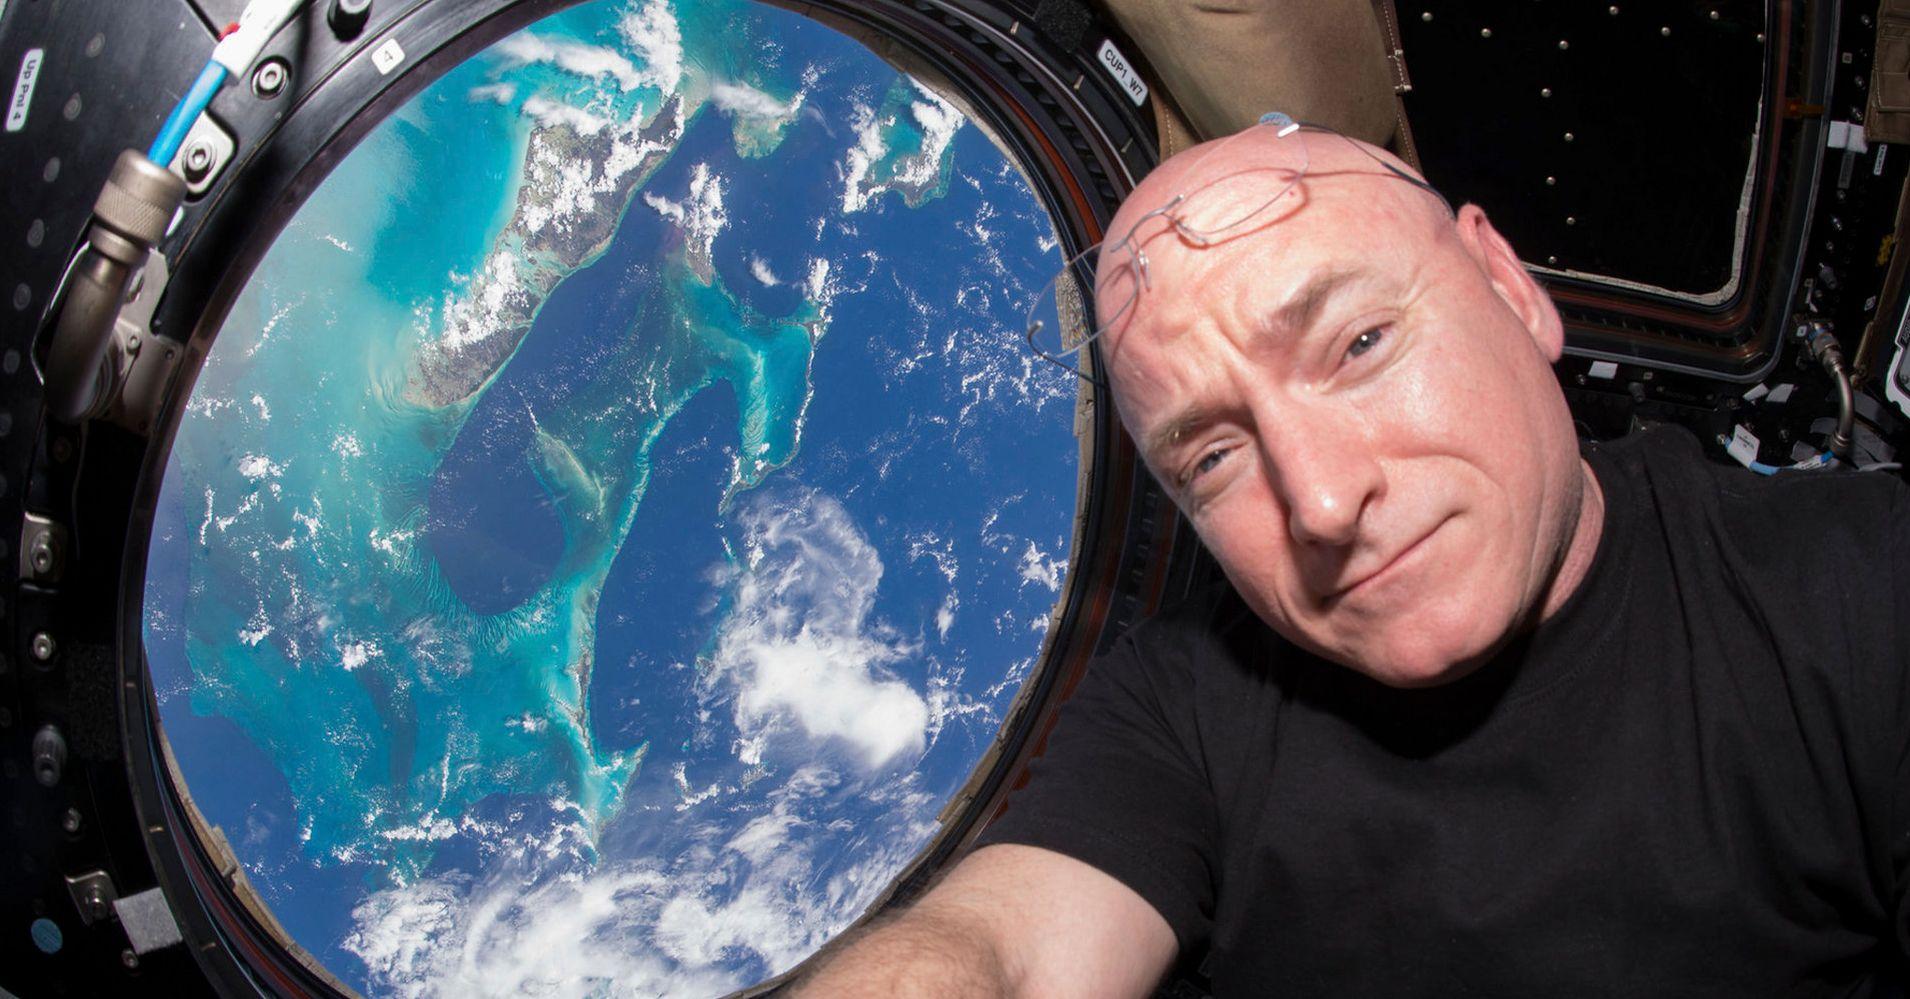 space shuttle program waste of money - photo #11